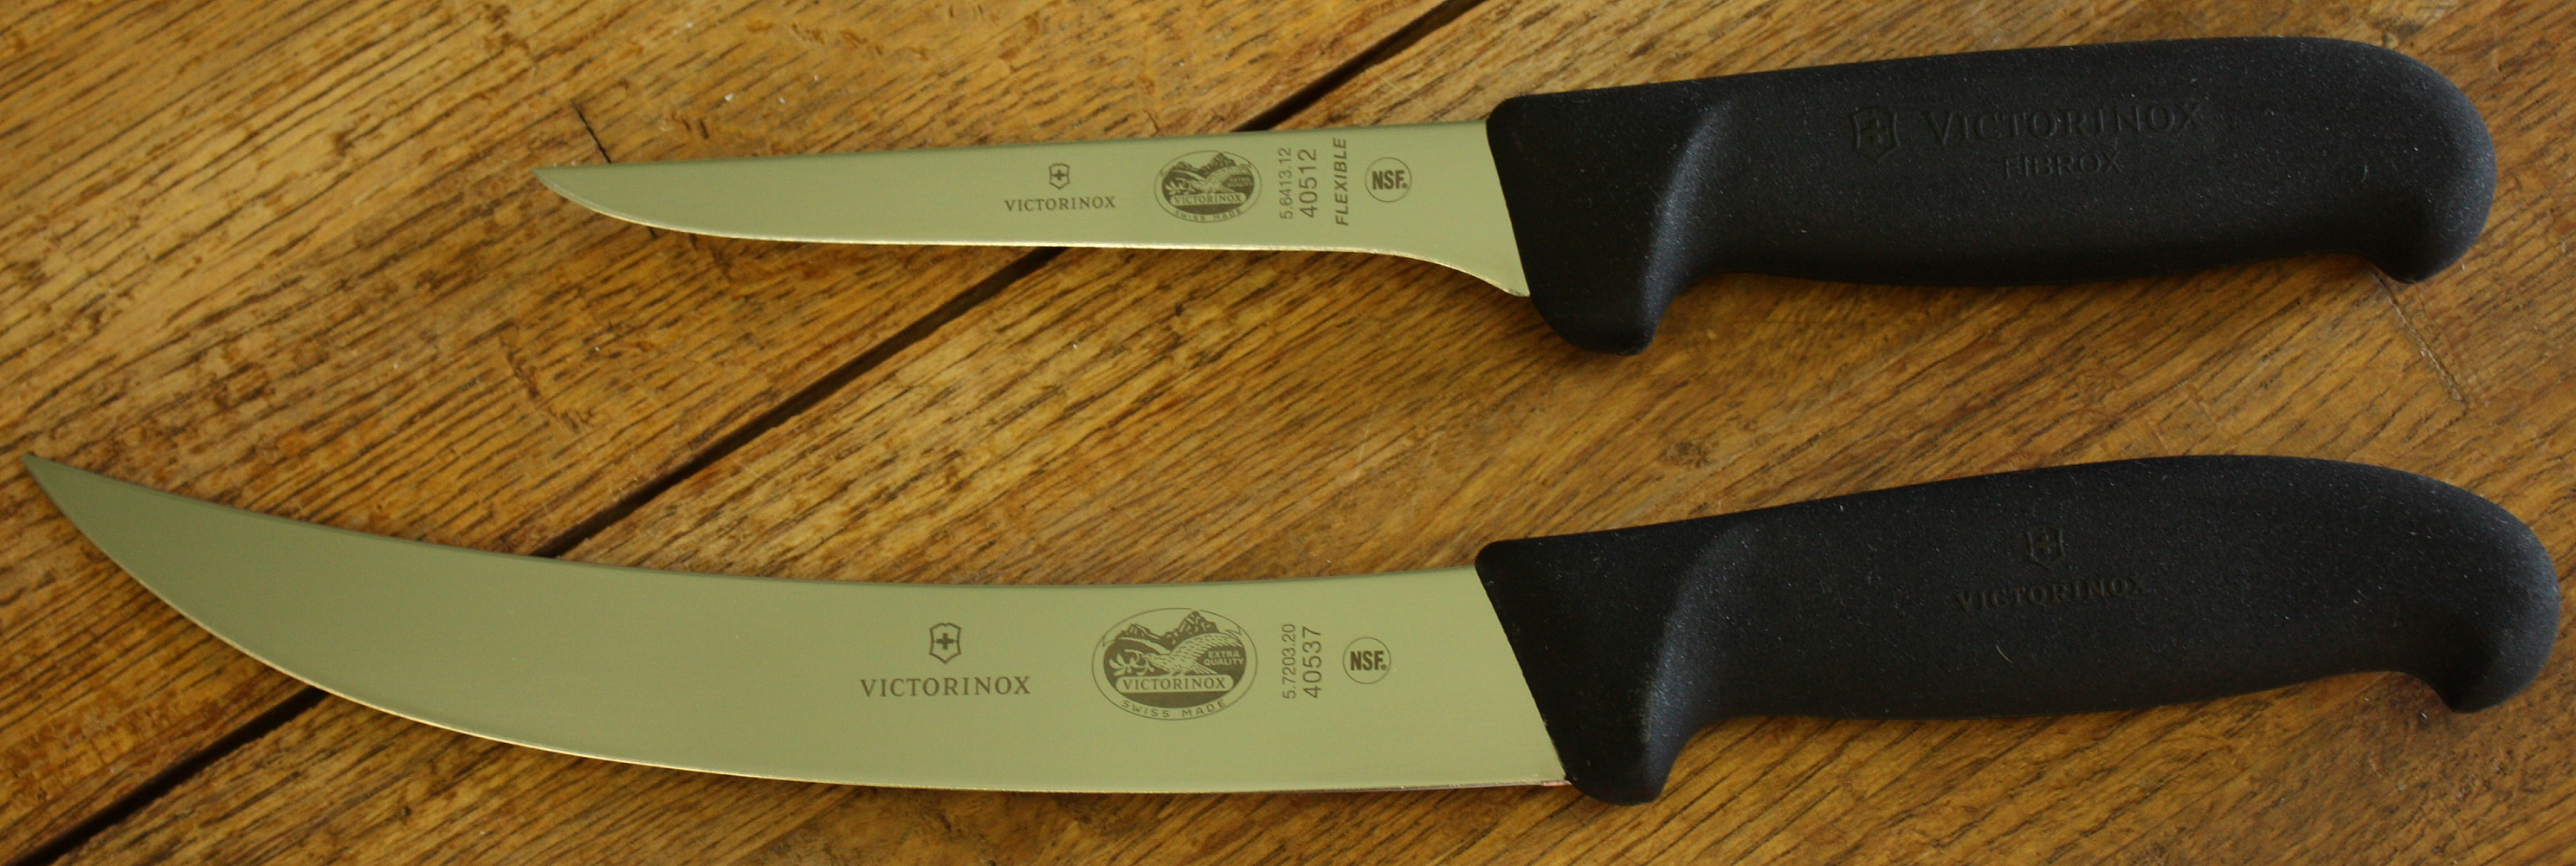 forschner victorinox 8 inch breaking knife purchase the forschner 5 inch boning knife and the forschner 8 inch breaking knife at this